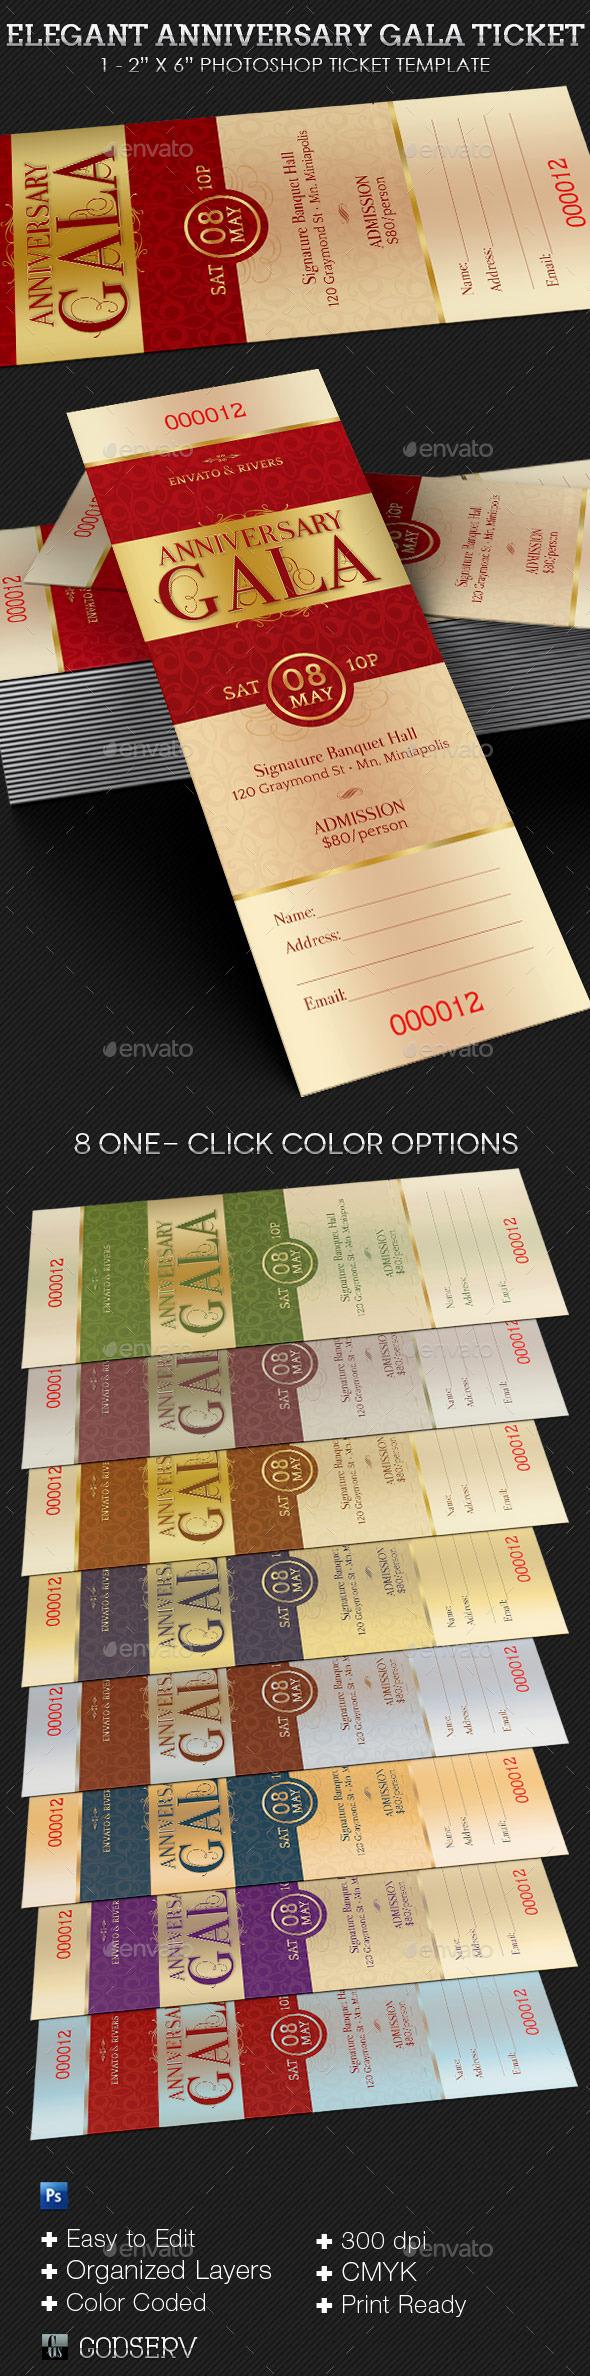 GraphicRiver Elegant Anniversary Gala Ticket Template 8989222